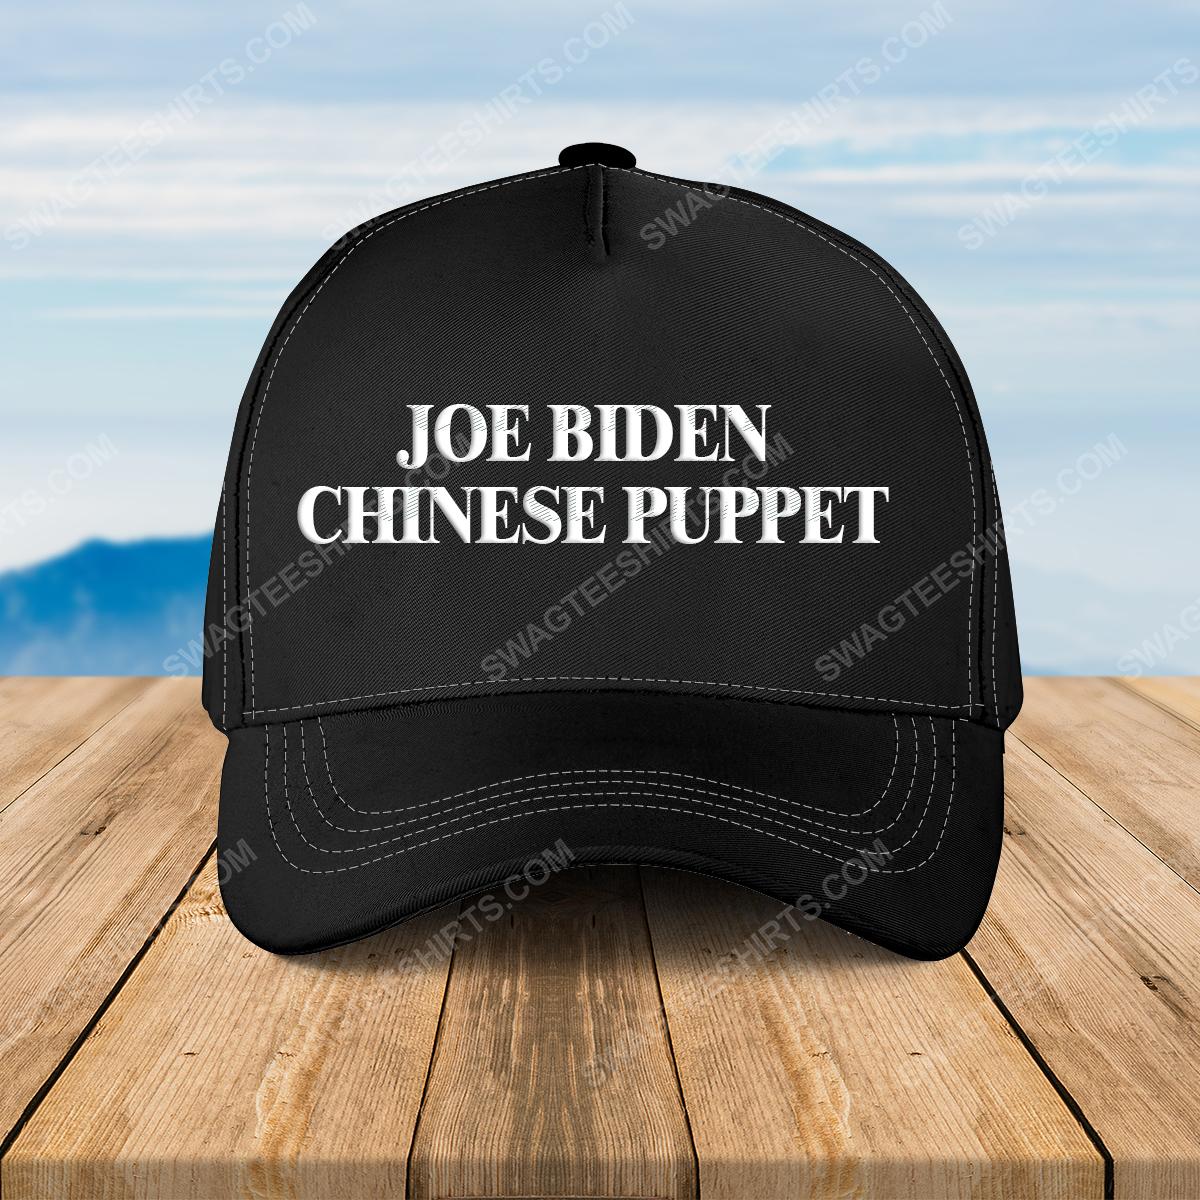 Joe biden chinese puppet full print classic hat 1 - Copy (2)